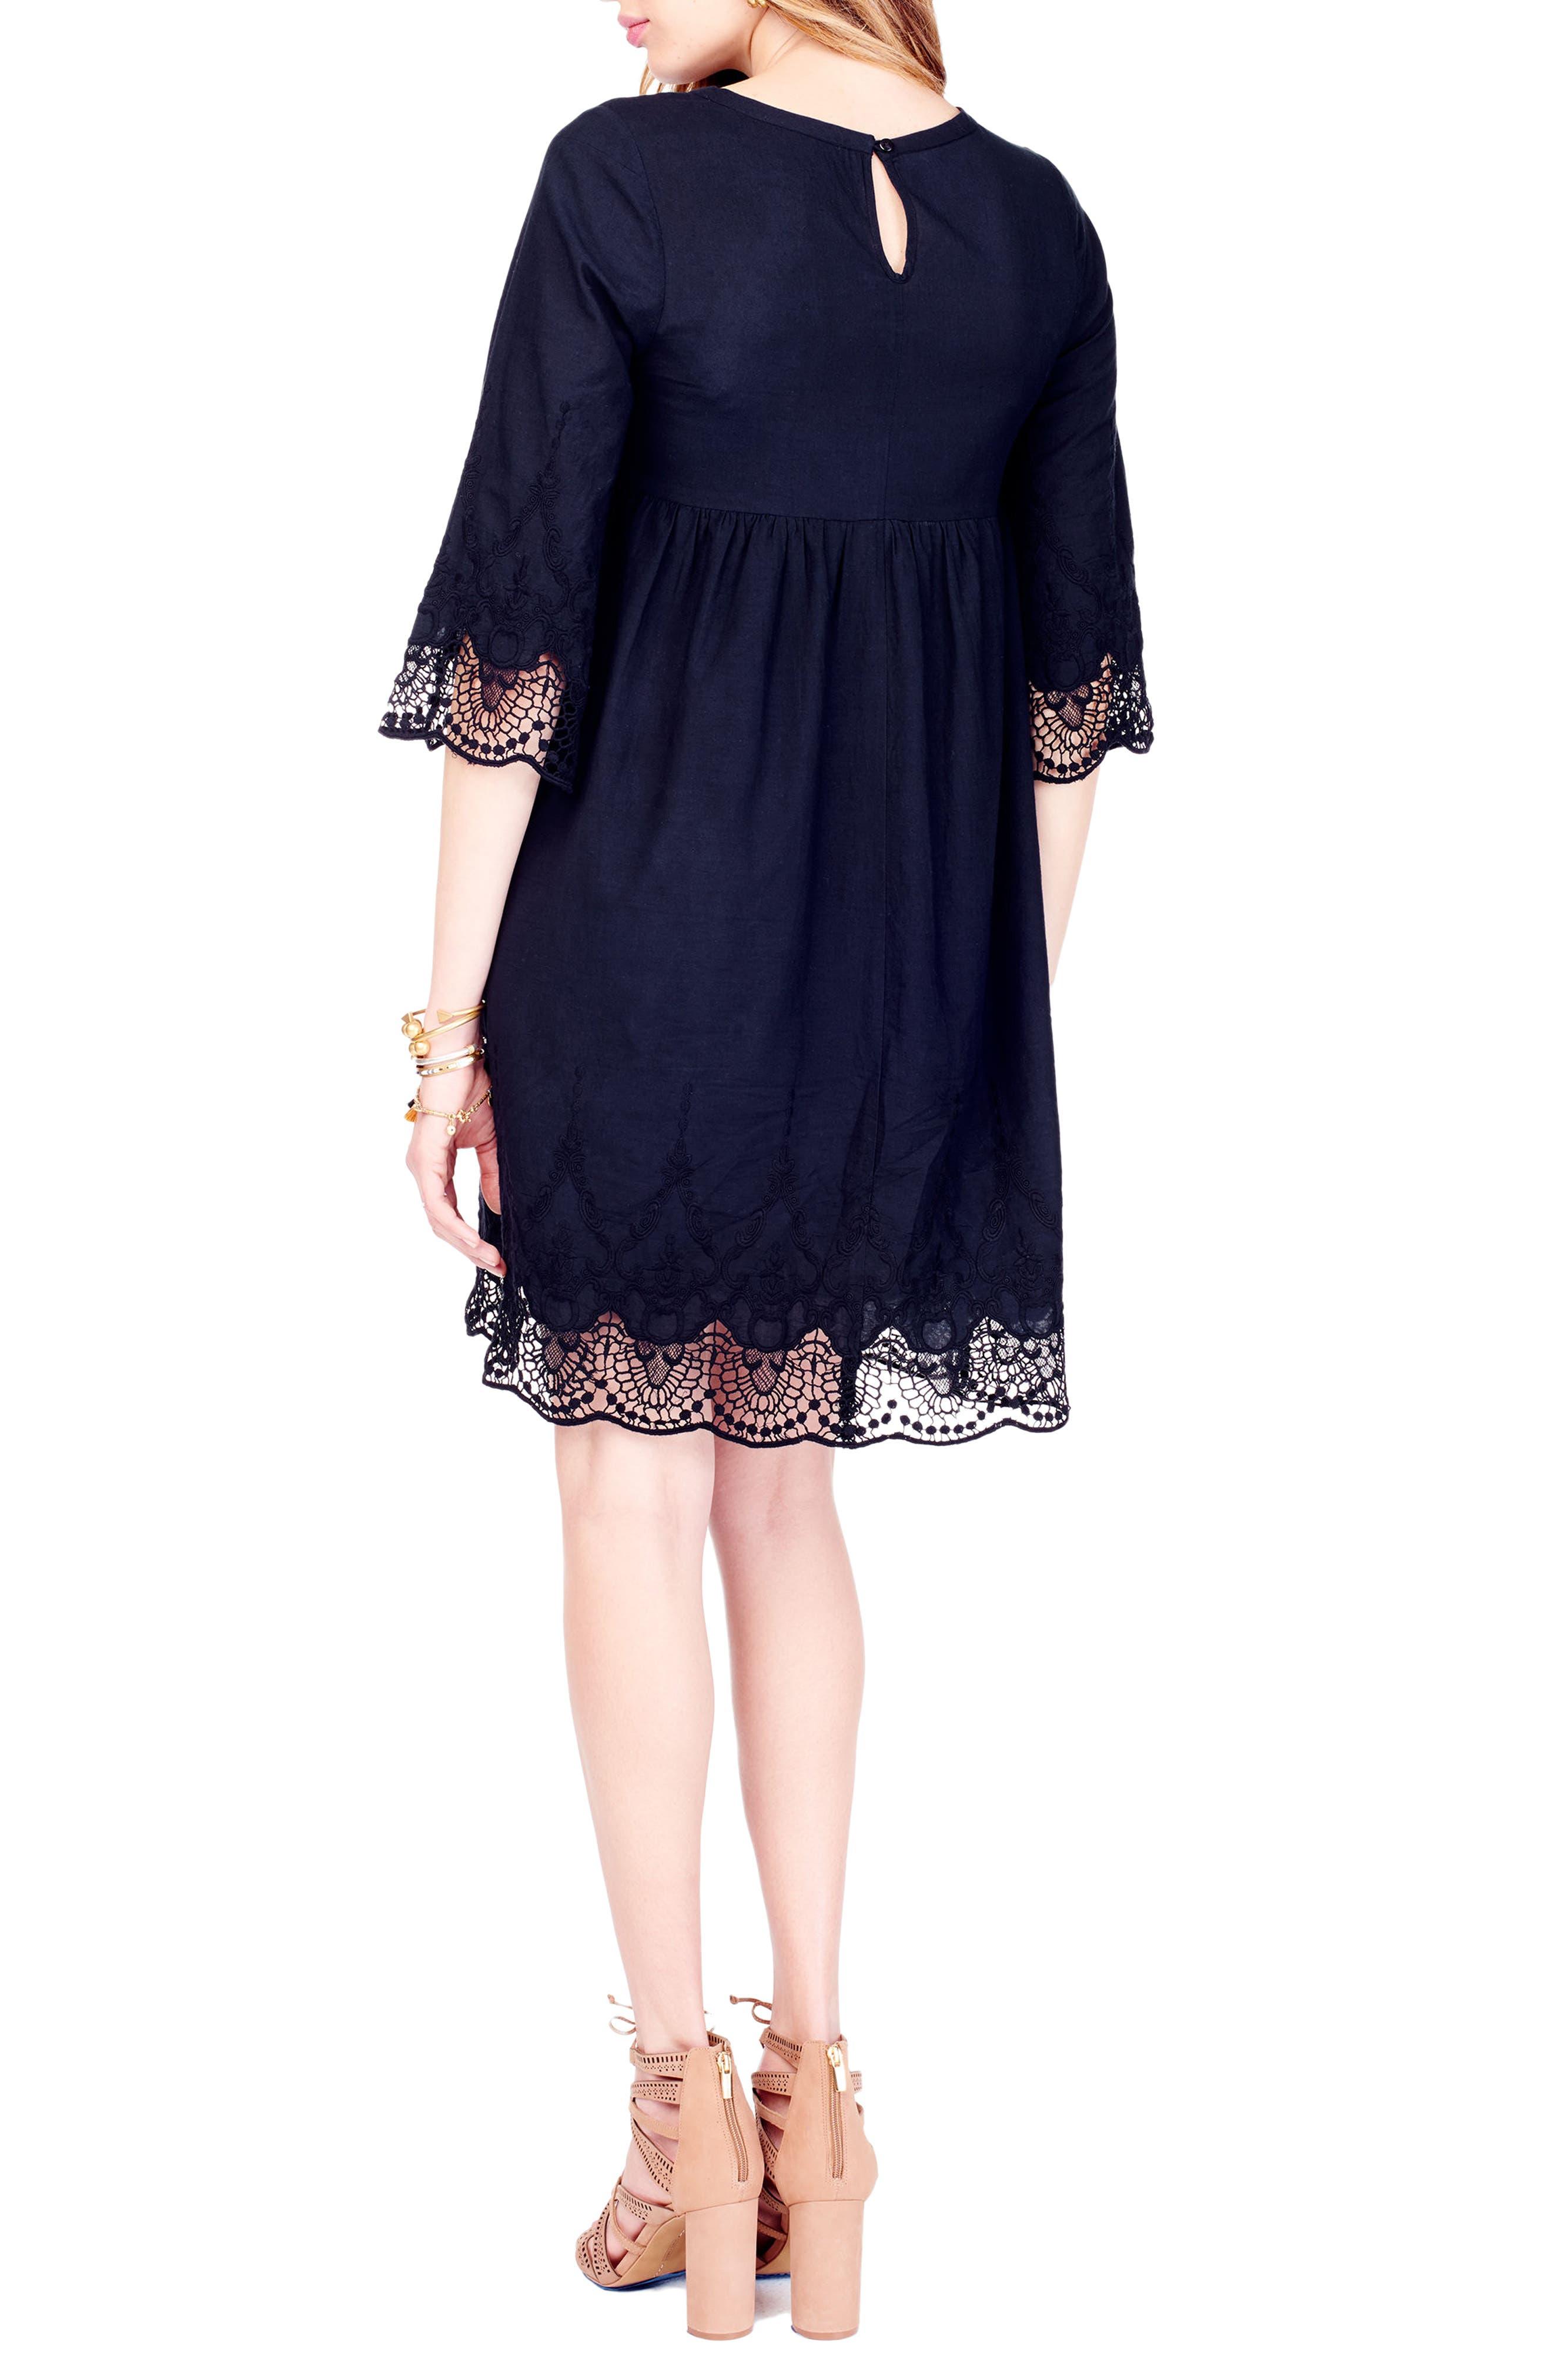 Lace Trim Maternity Dress,                             Alternate thumbnail 2, color,                             001